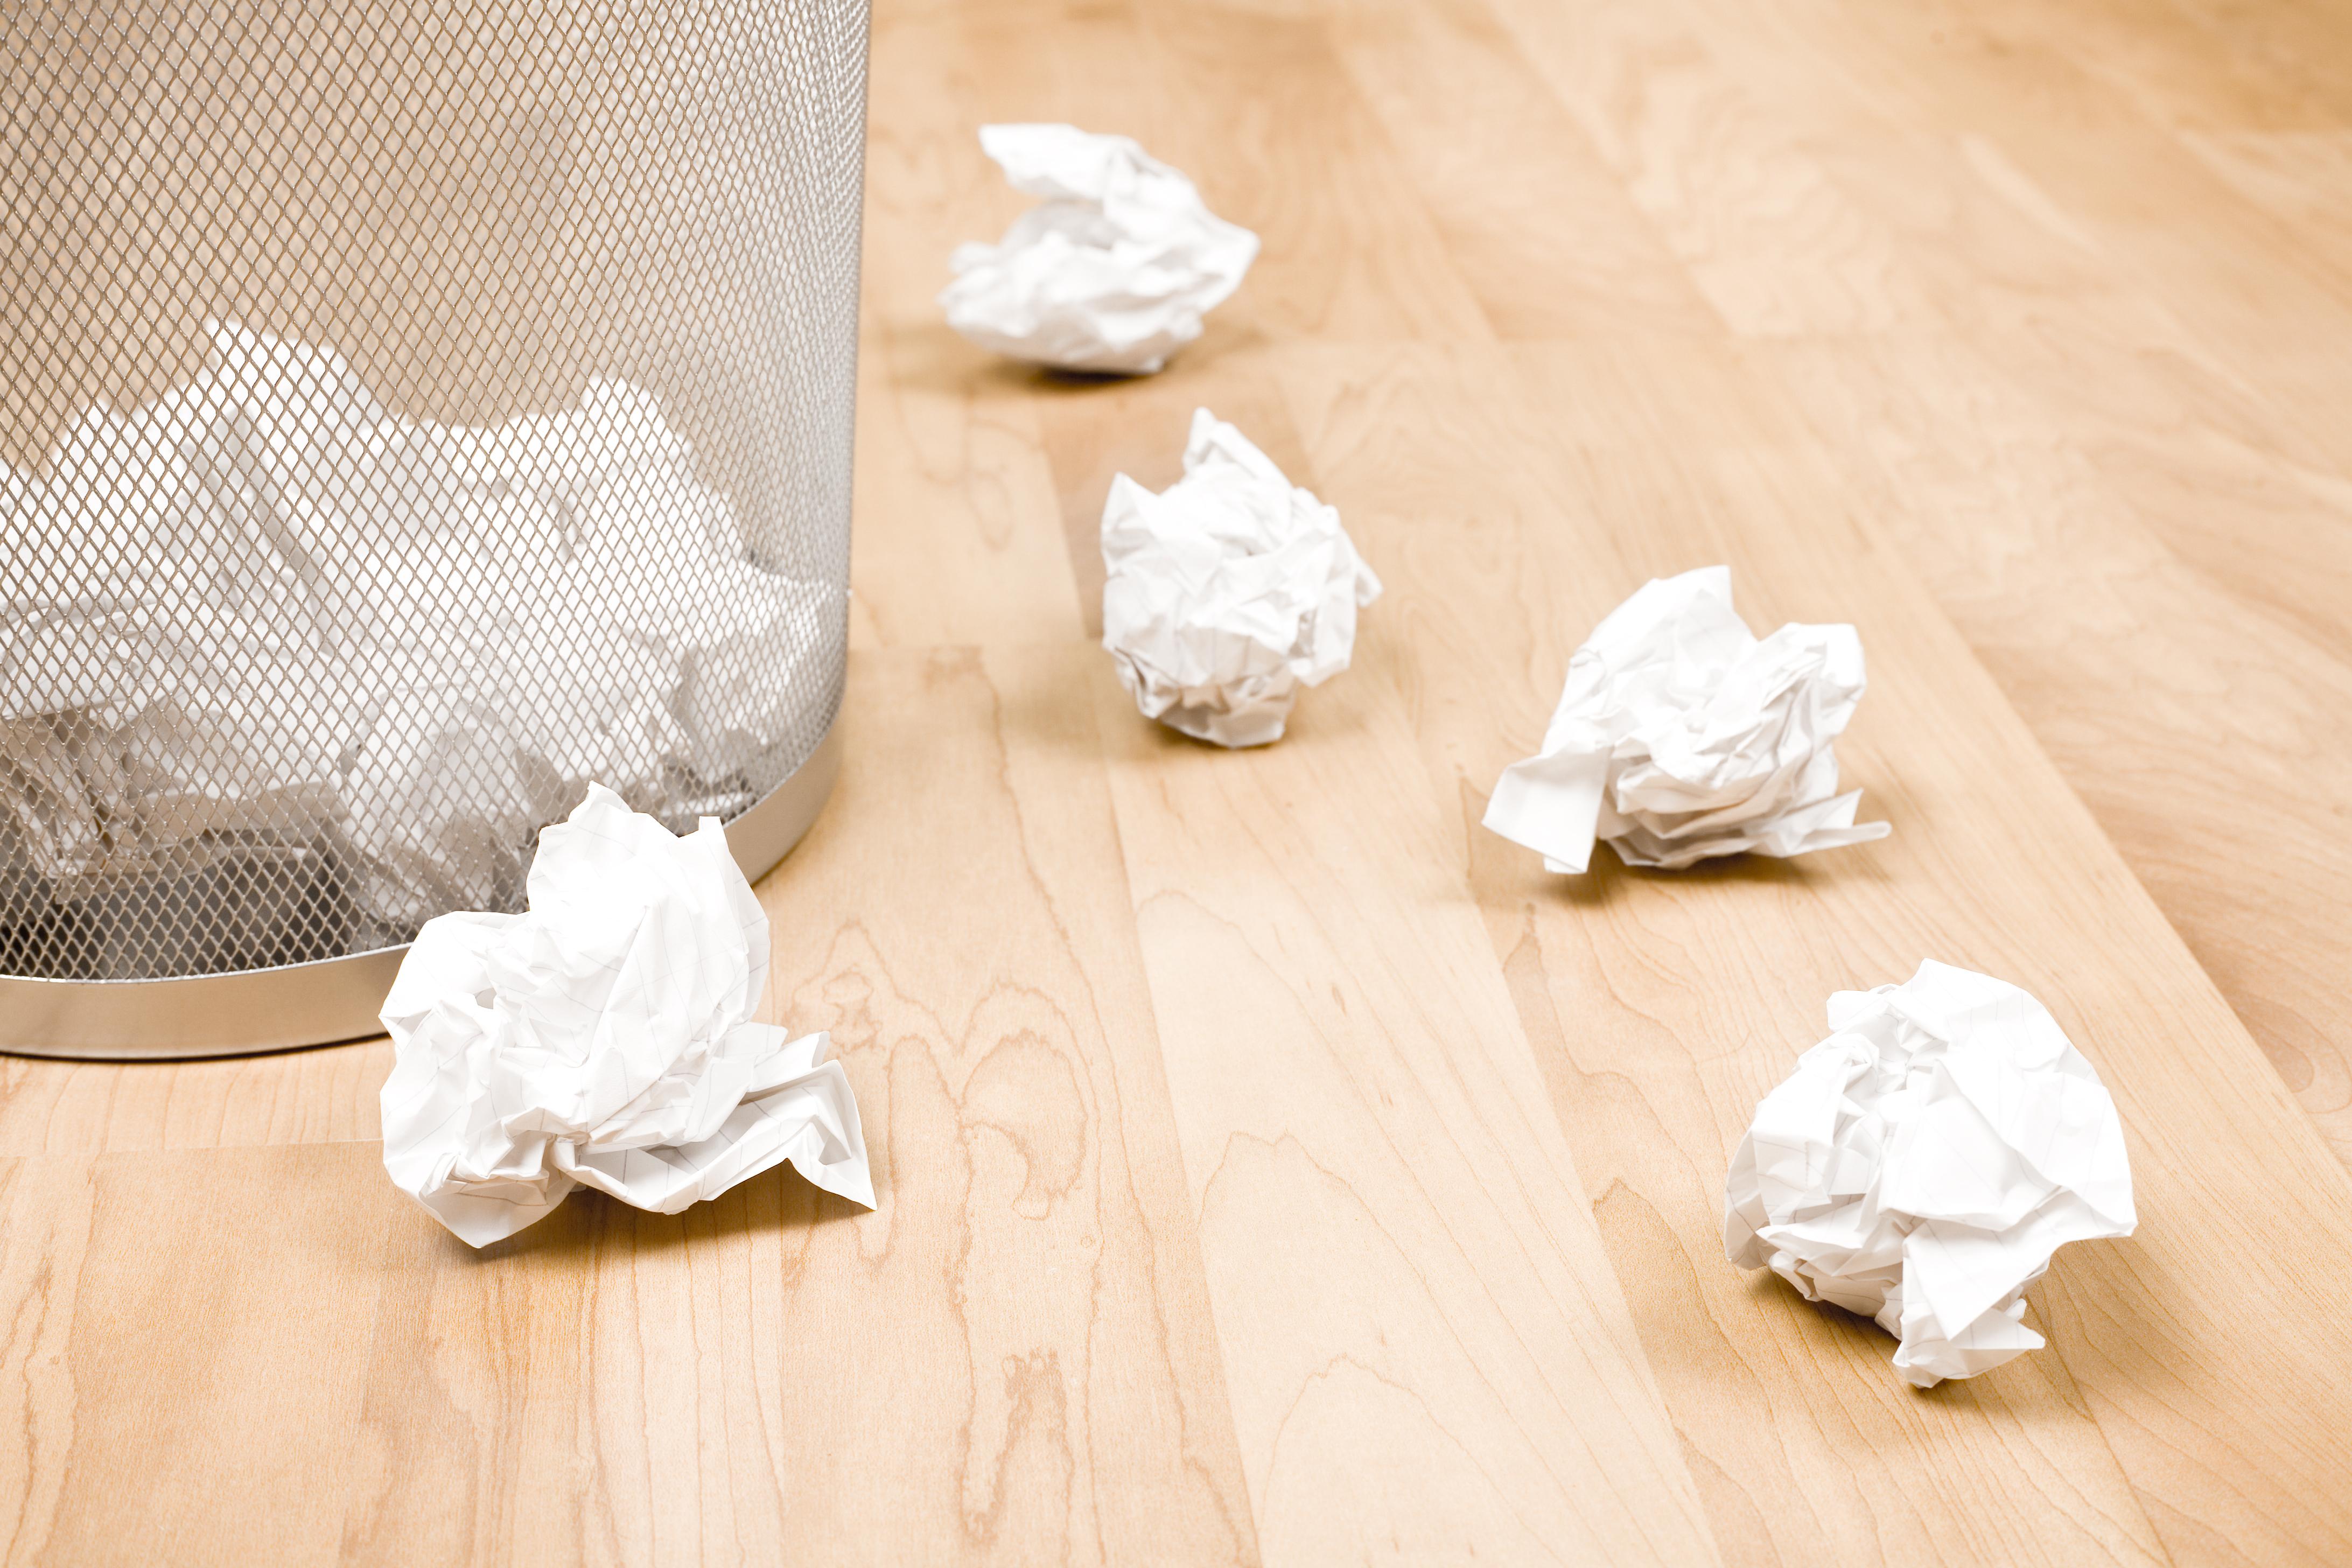 Trash Bin - Writer's Block